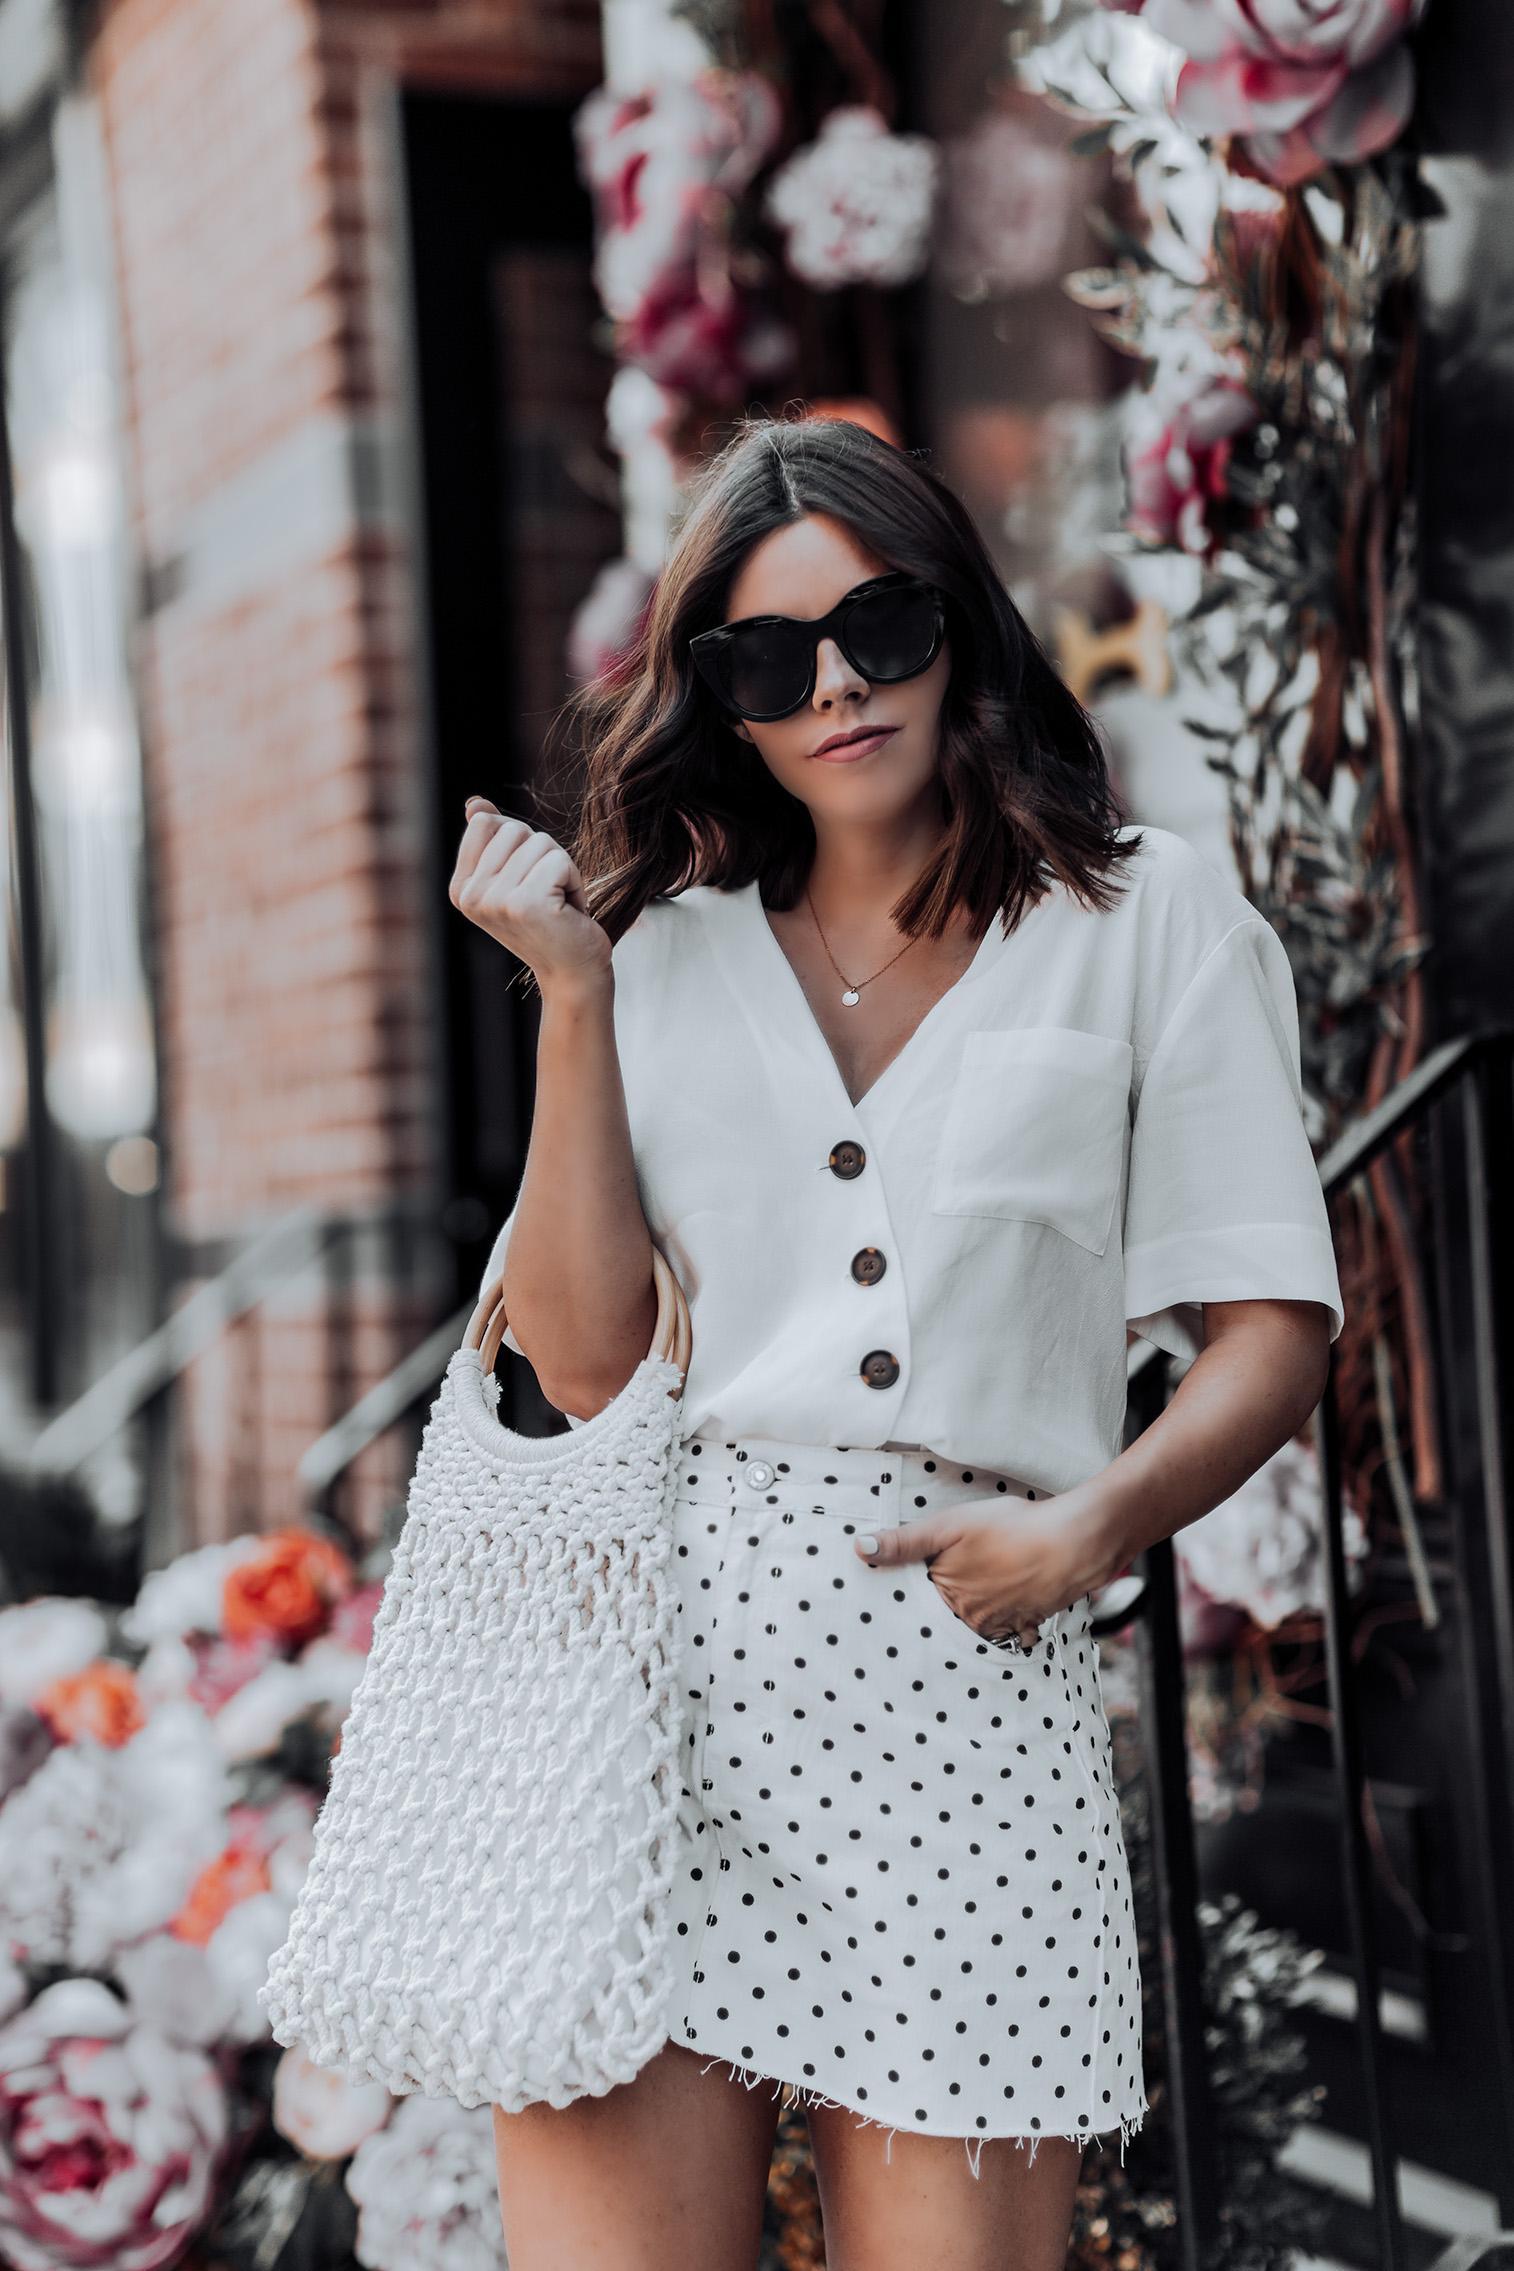 All white |Topshop Polka Dot Skirt | Topshop Blouse | String Shopper Bag | Woven Mules| Straw handbag Trend | Streetstyle blog #streetstyle #ootd #liketkit #topshop